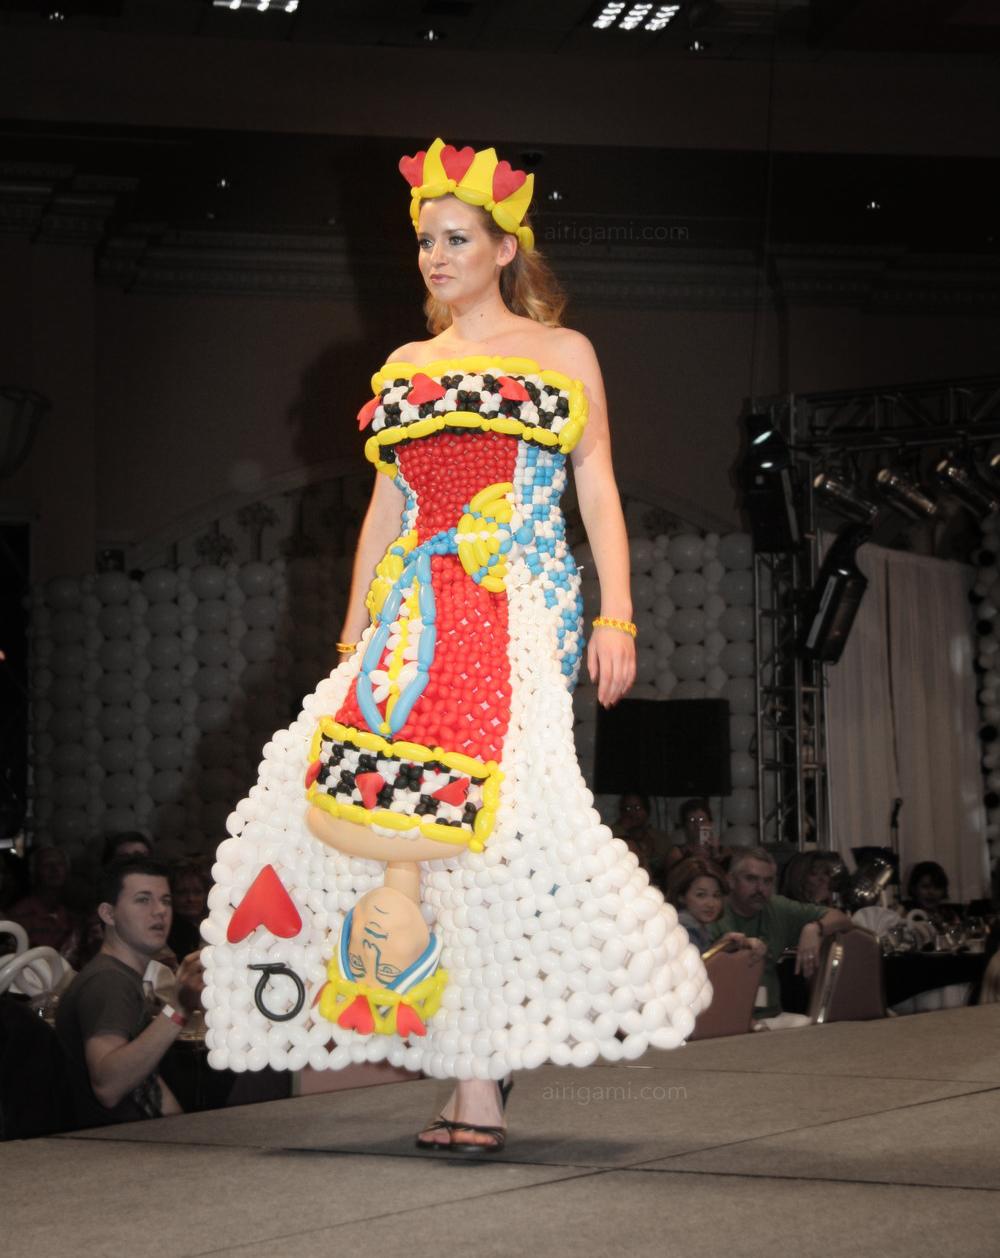 Airigami-balloon-dress-queen.jpg